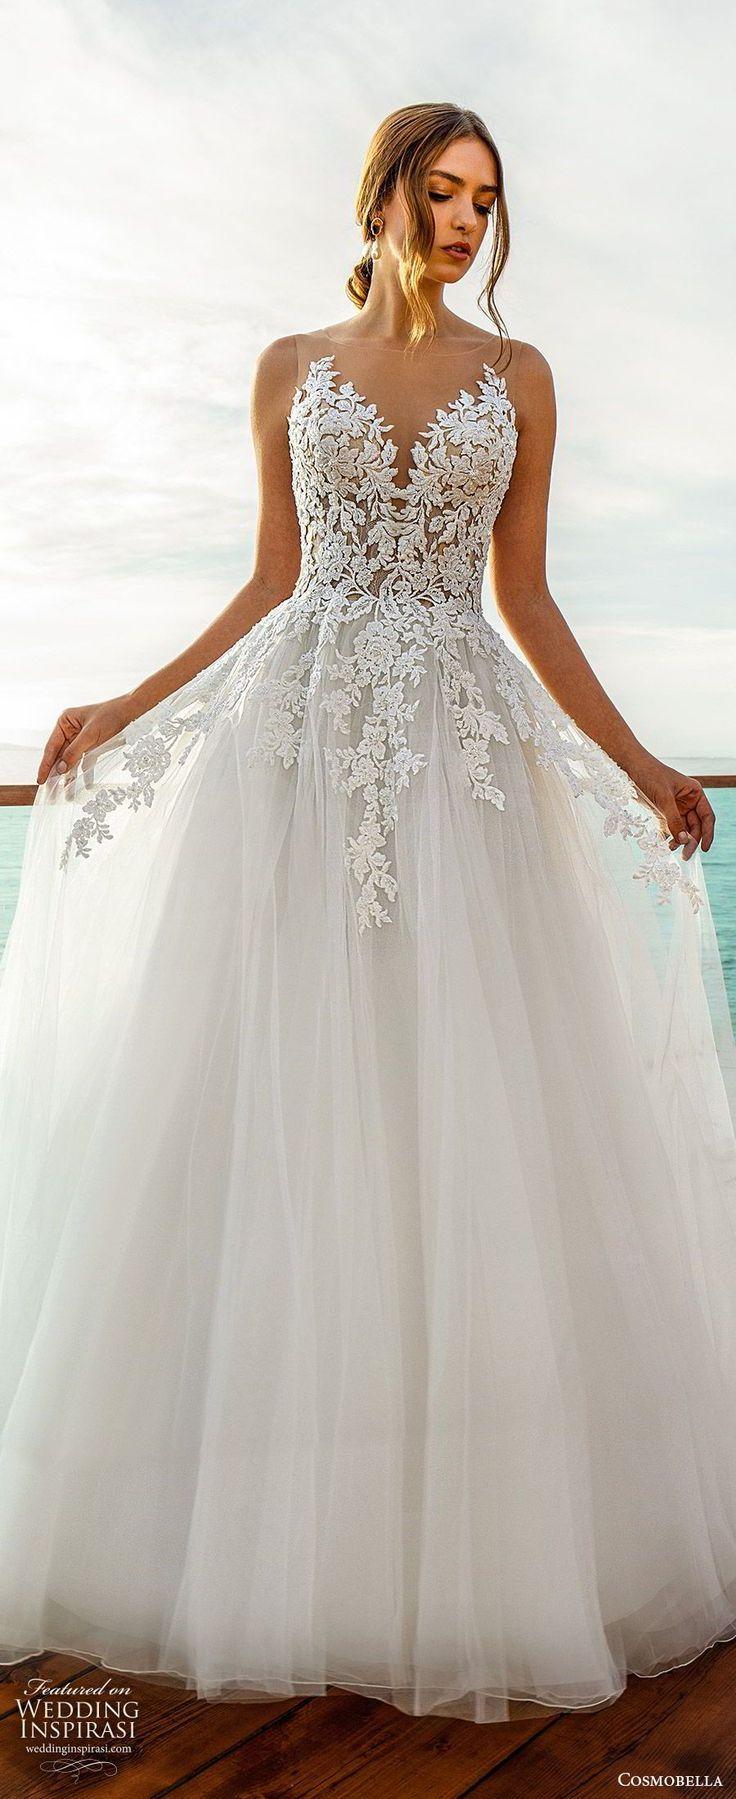 "Cosmobella 2020 Brautkleider – ""Ethereal Elegance"" Bridal Collection"